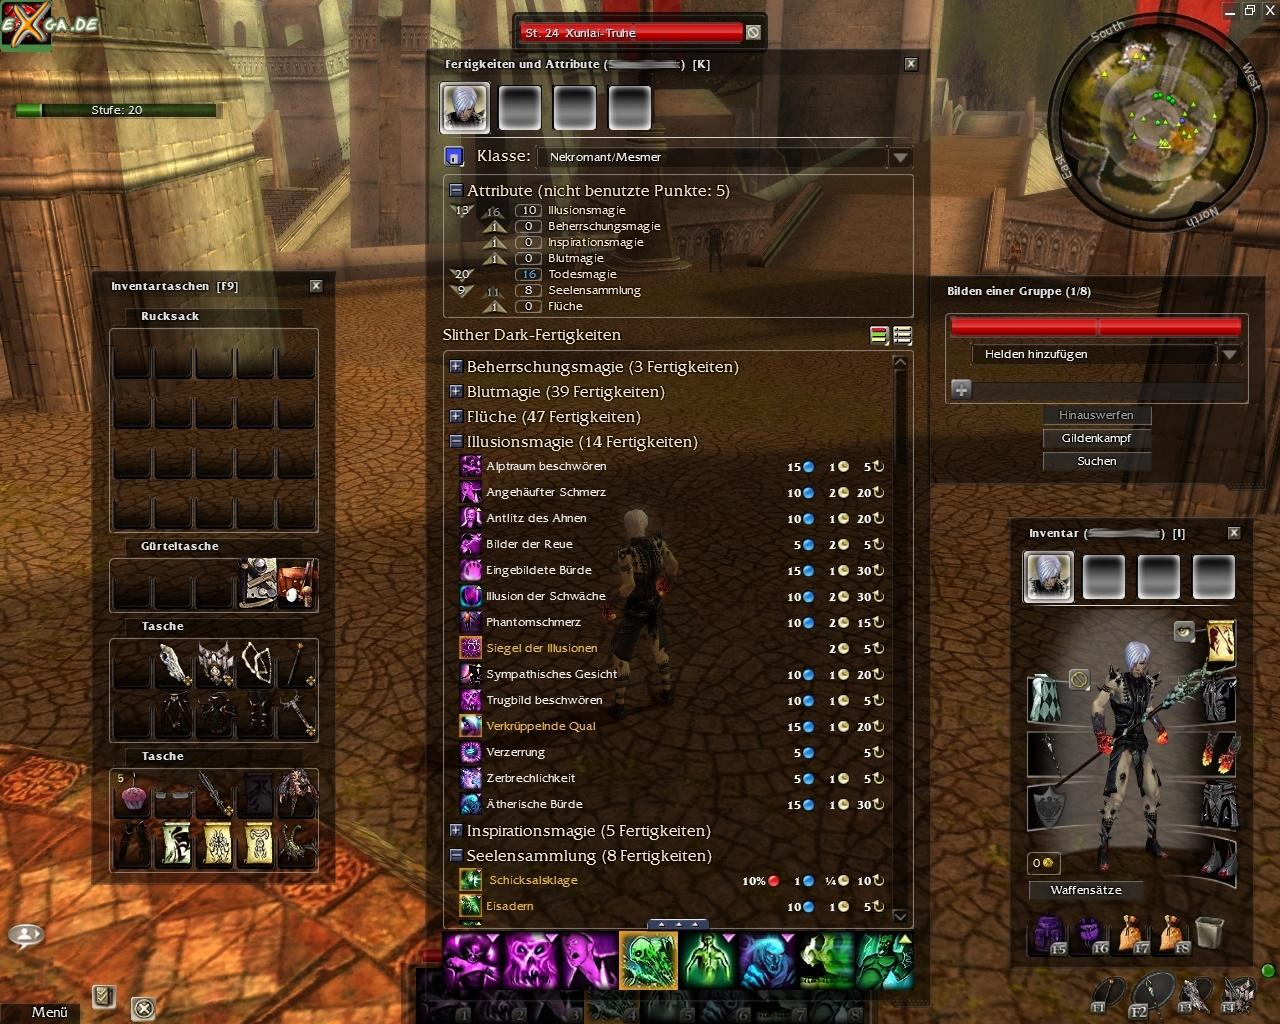 Guild wars 2 nude texmod nude video